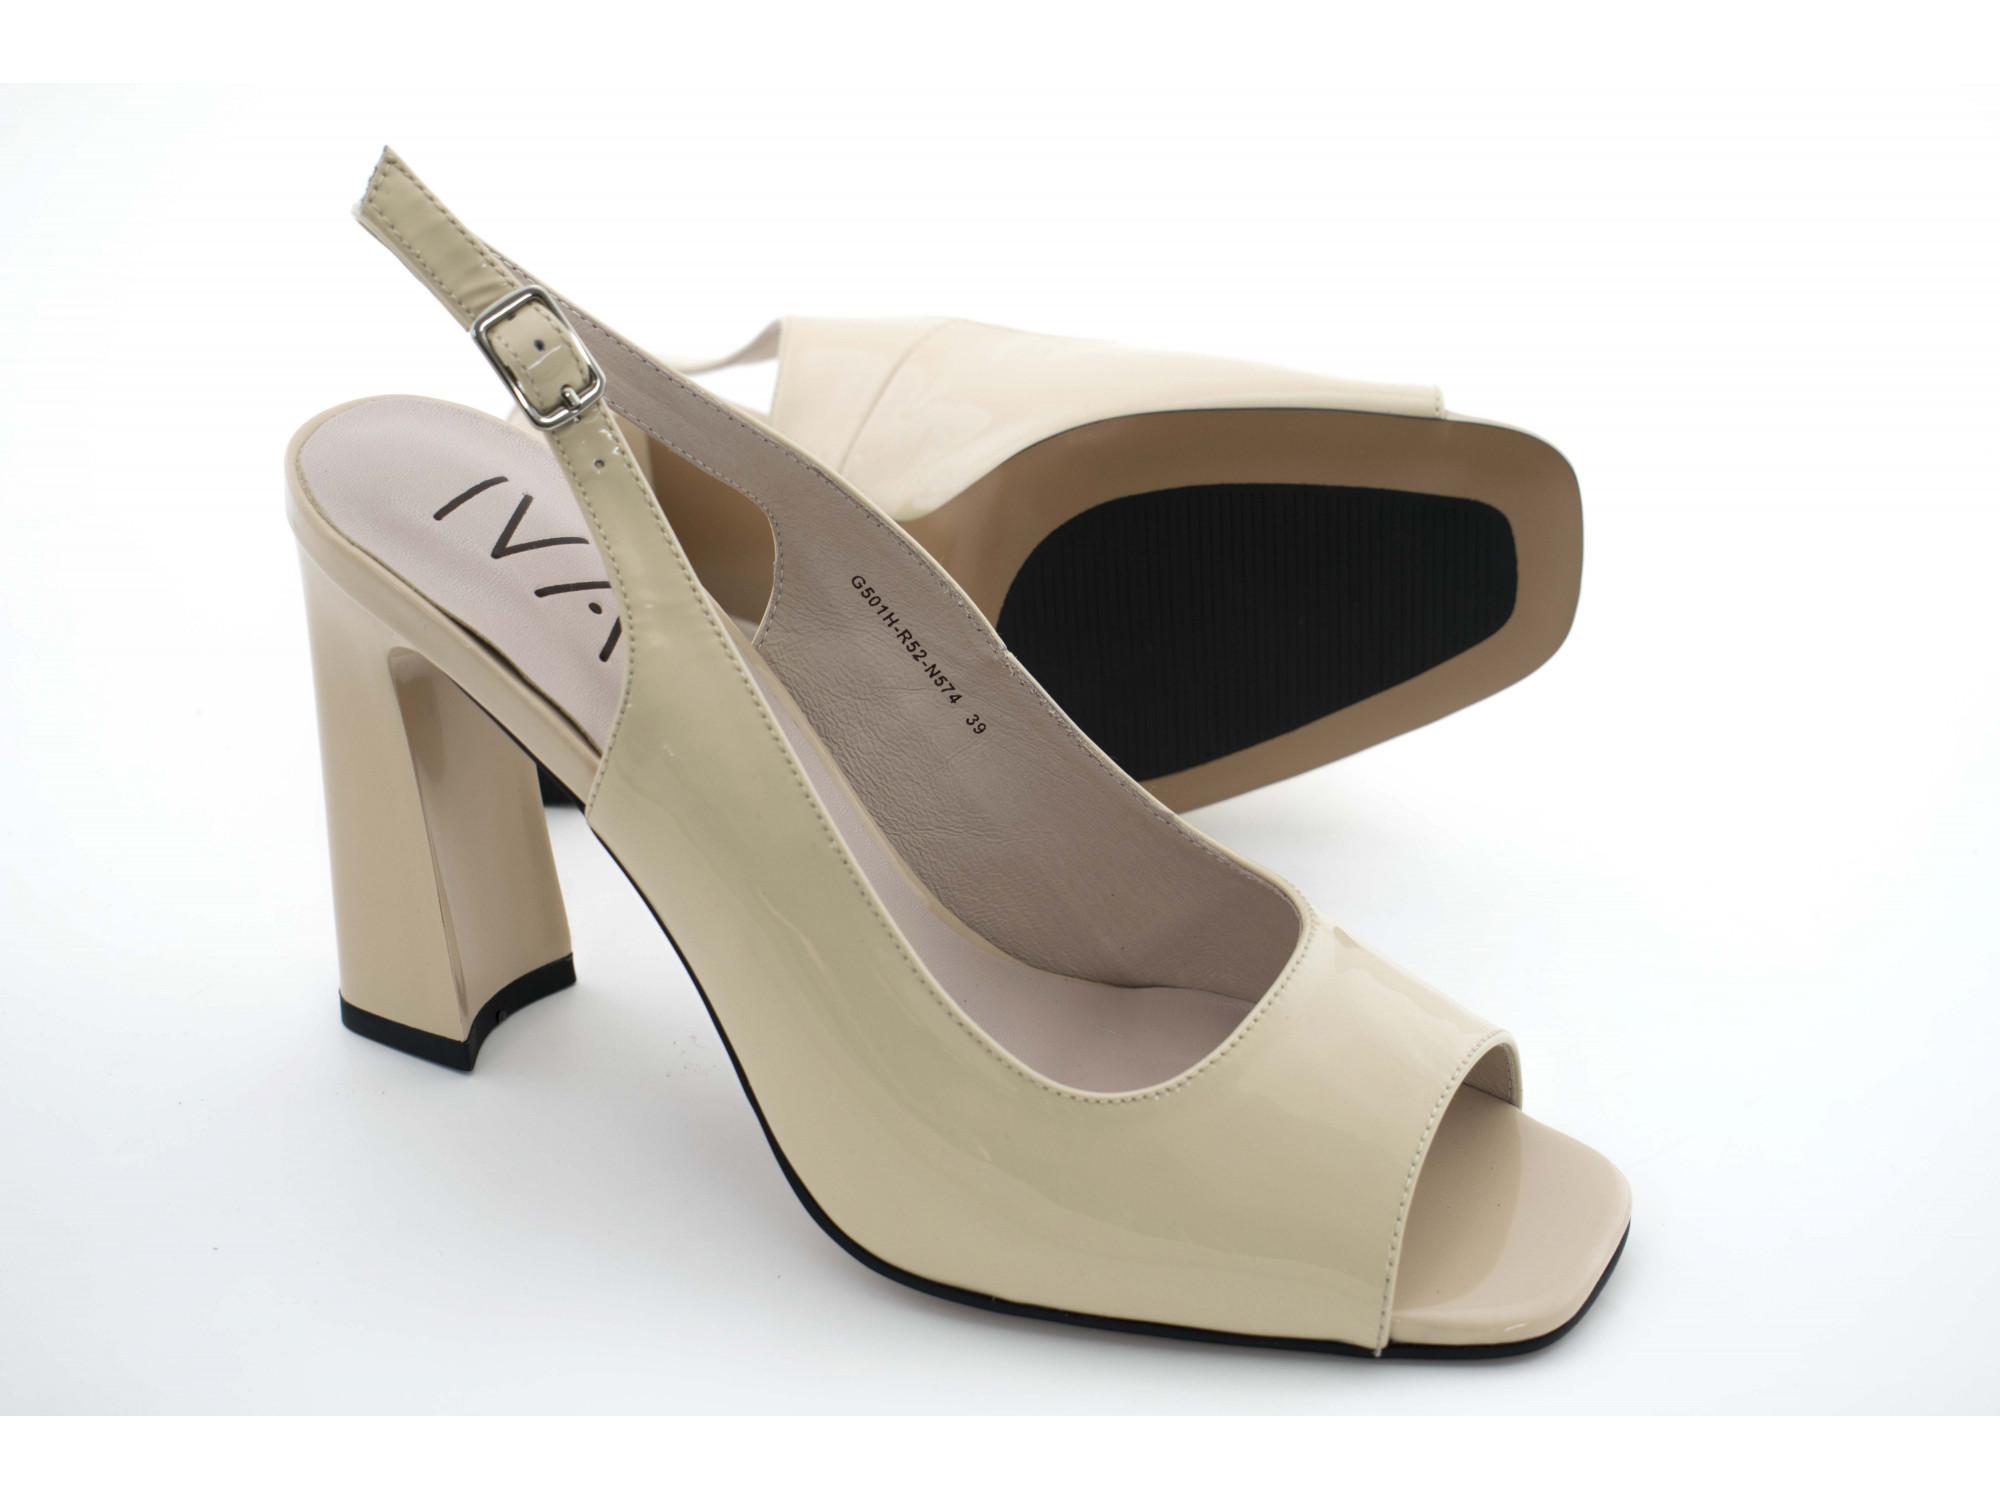 Летние туфли IVA G501H Бежевые